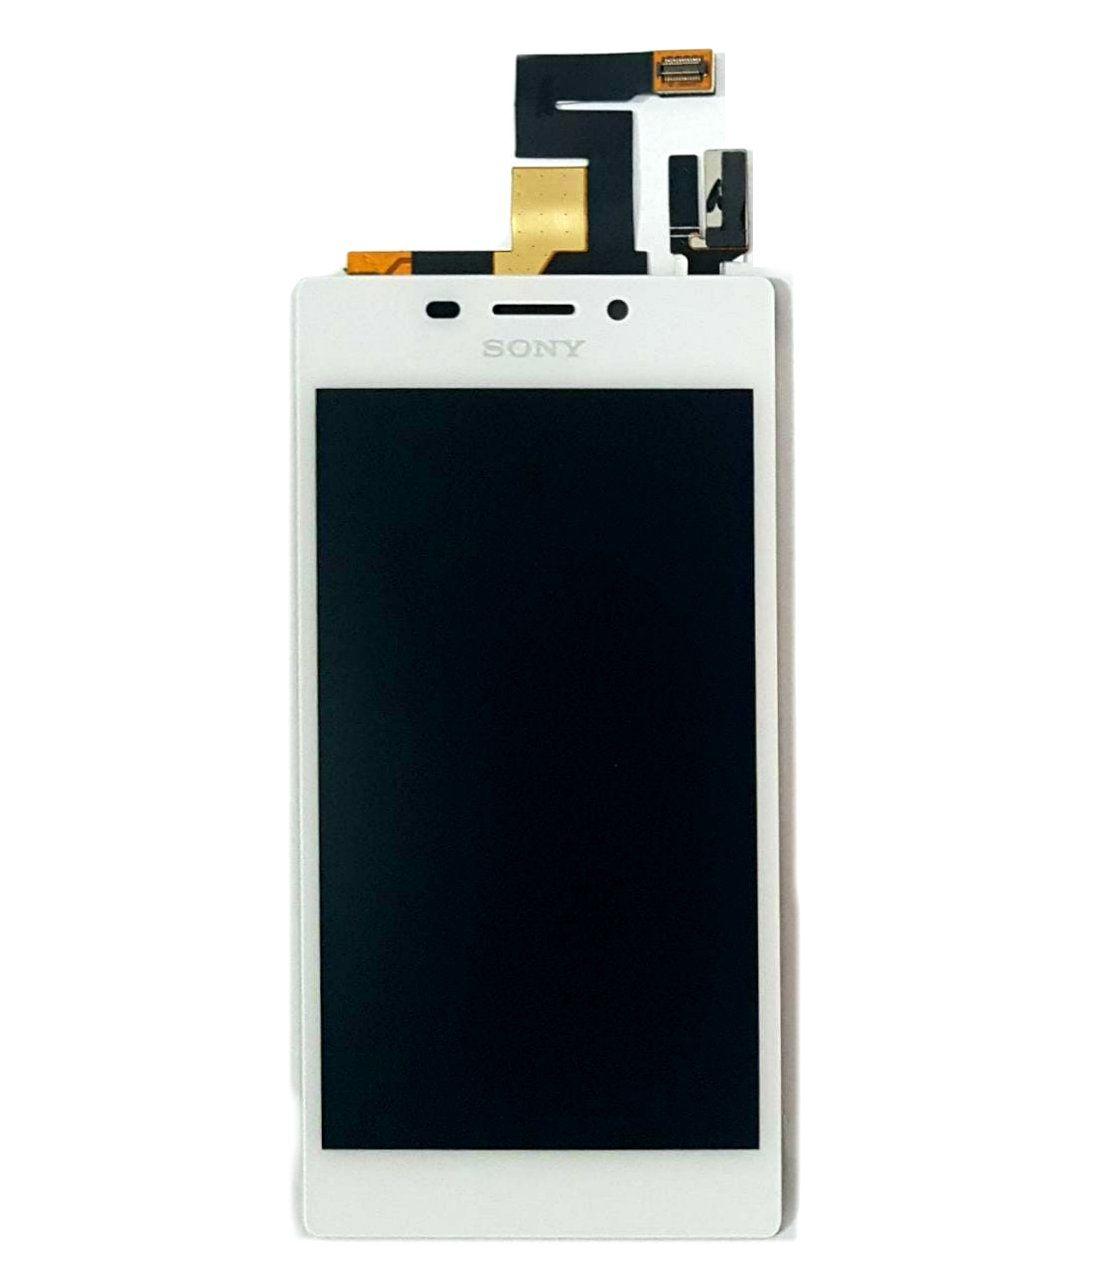 Display Frontal Sony Xperia M2 D2403 Branco 1 Linha sem Aro